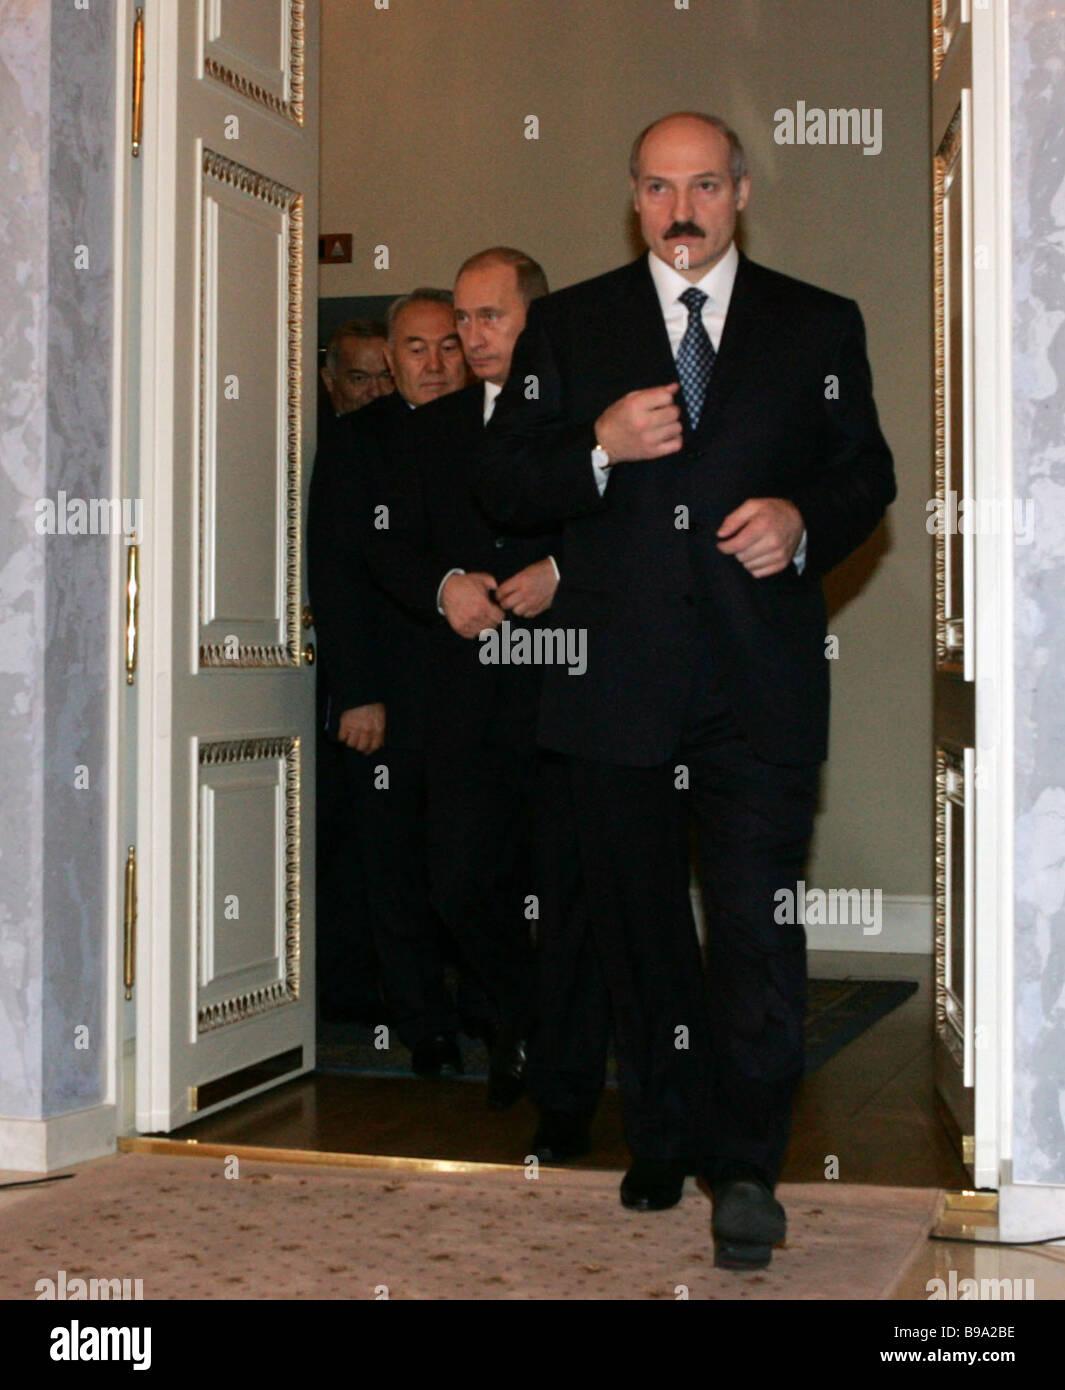 Alexander Lukashenko Belarussian president Vladimir Putin Russian president Nursultan Nazarbayev Kazakh president Stock Photo